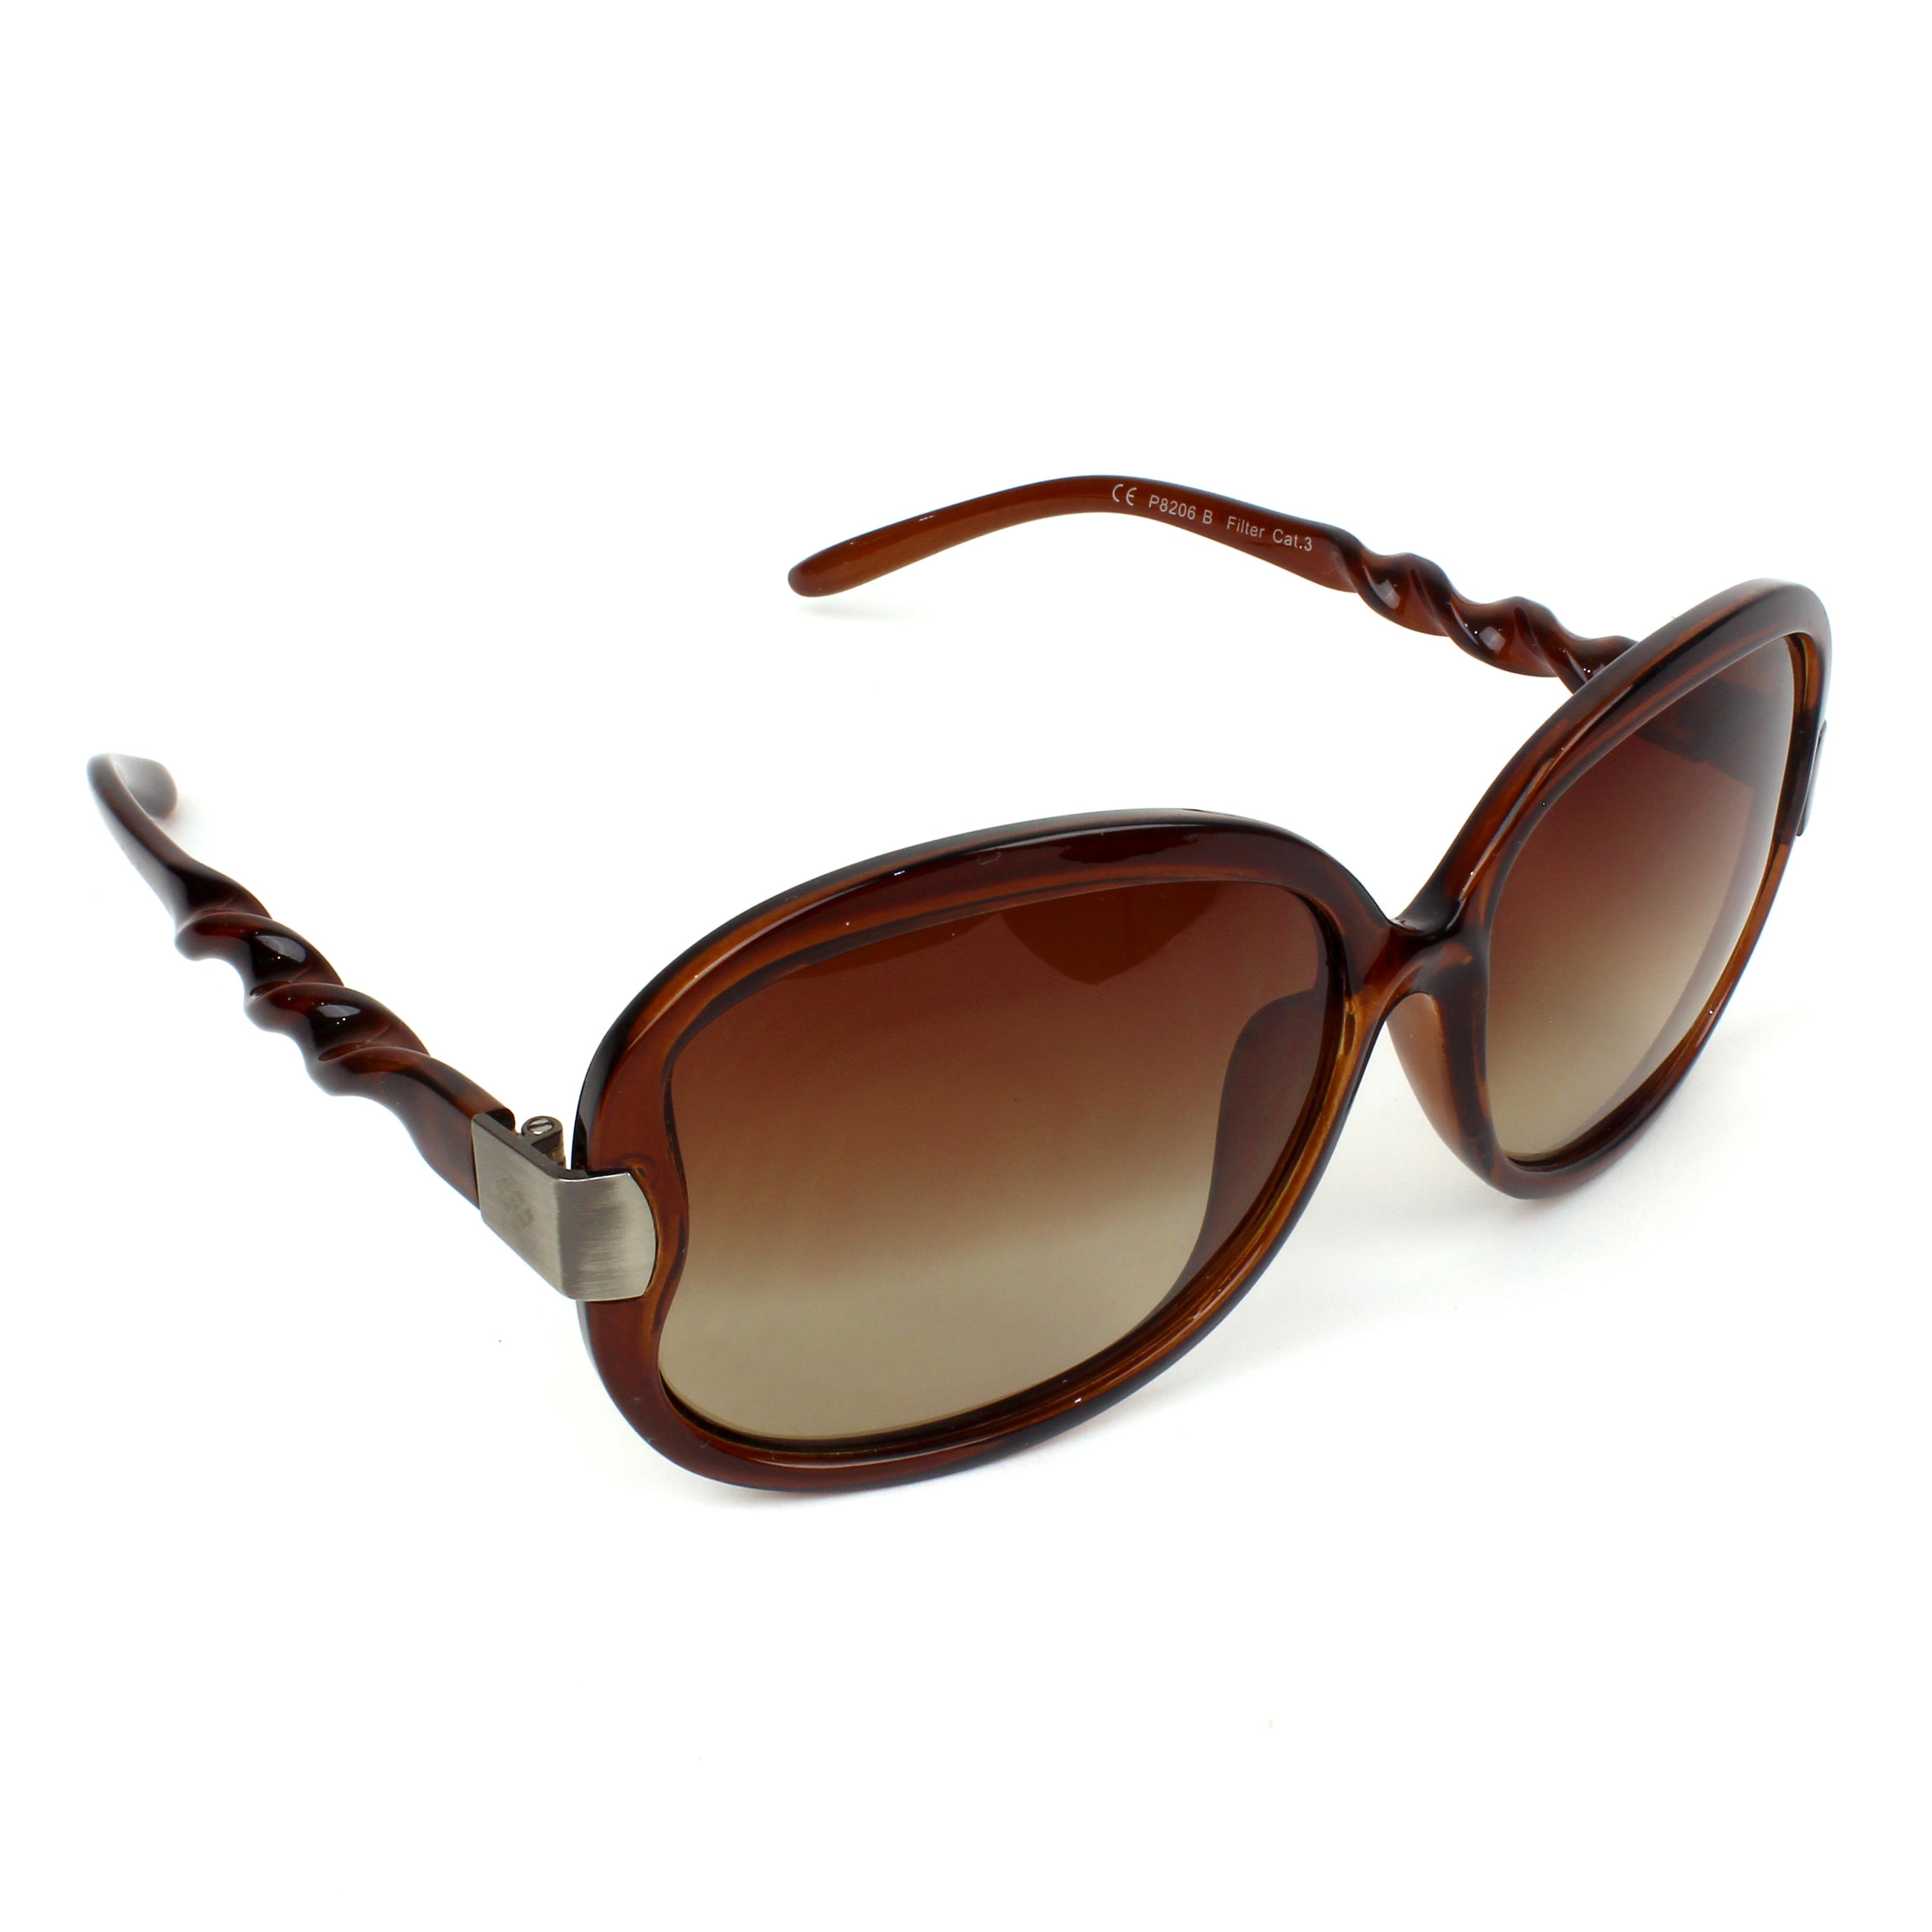 6804791139 Ladies Sunglasses Polaroid Polarized Lens UV400 CAT 3 Fashion Designer  8206B